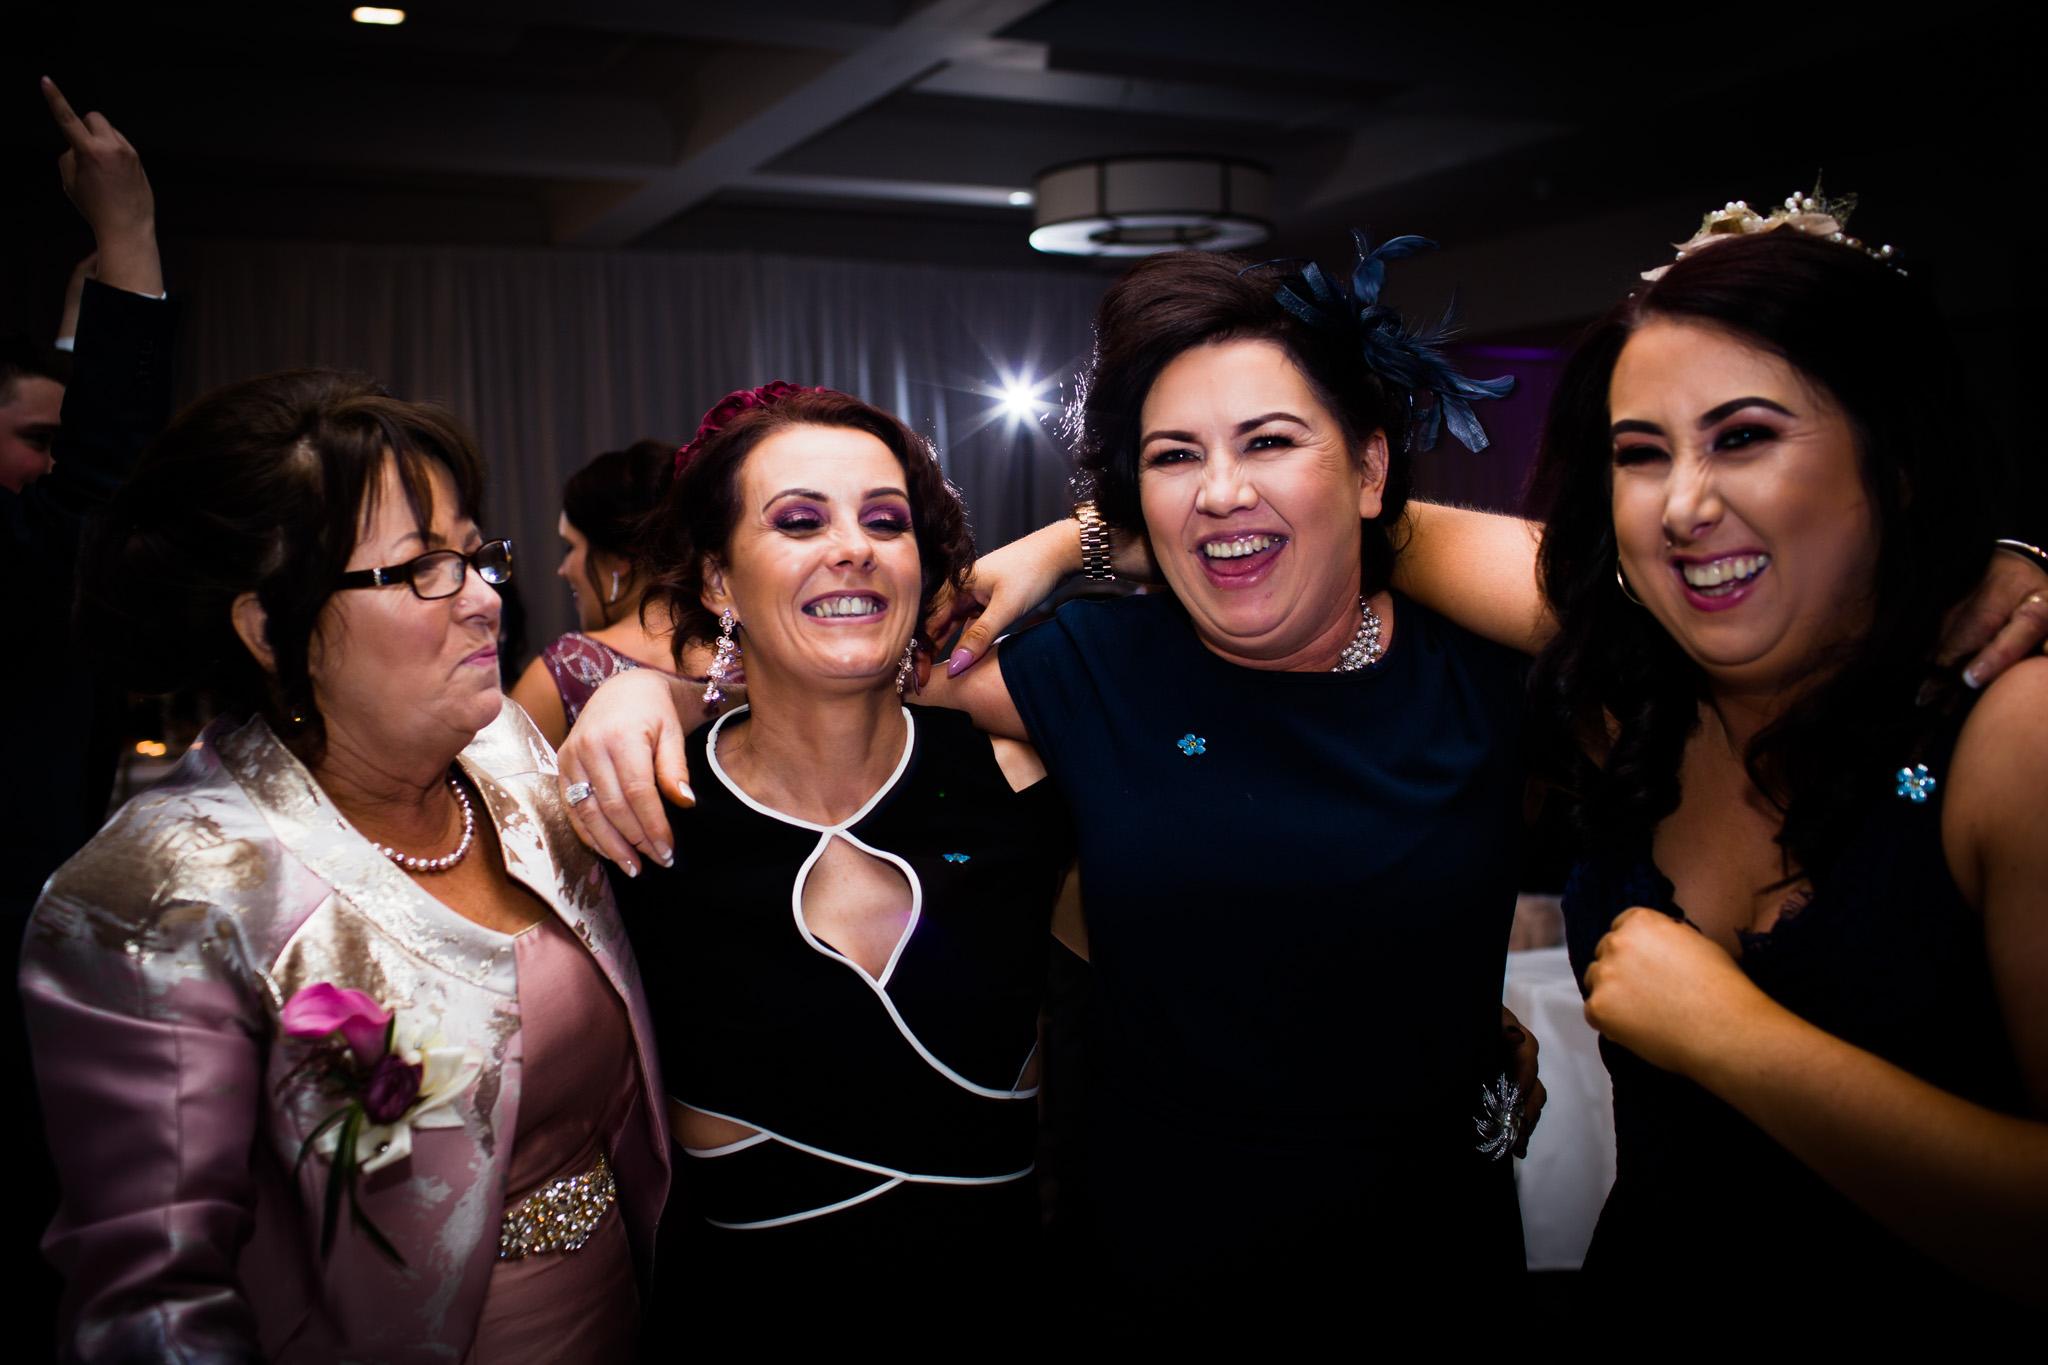 Mark_Barnes_Northern_Ireland_Wedding_Photography_Marine_hotel_ballycastle_Wedding_Photography_Janet&Darren-45.jpg